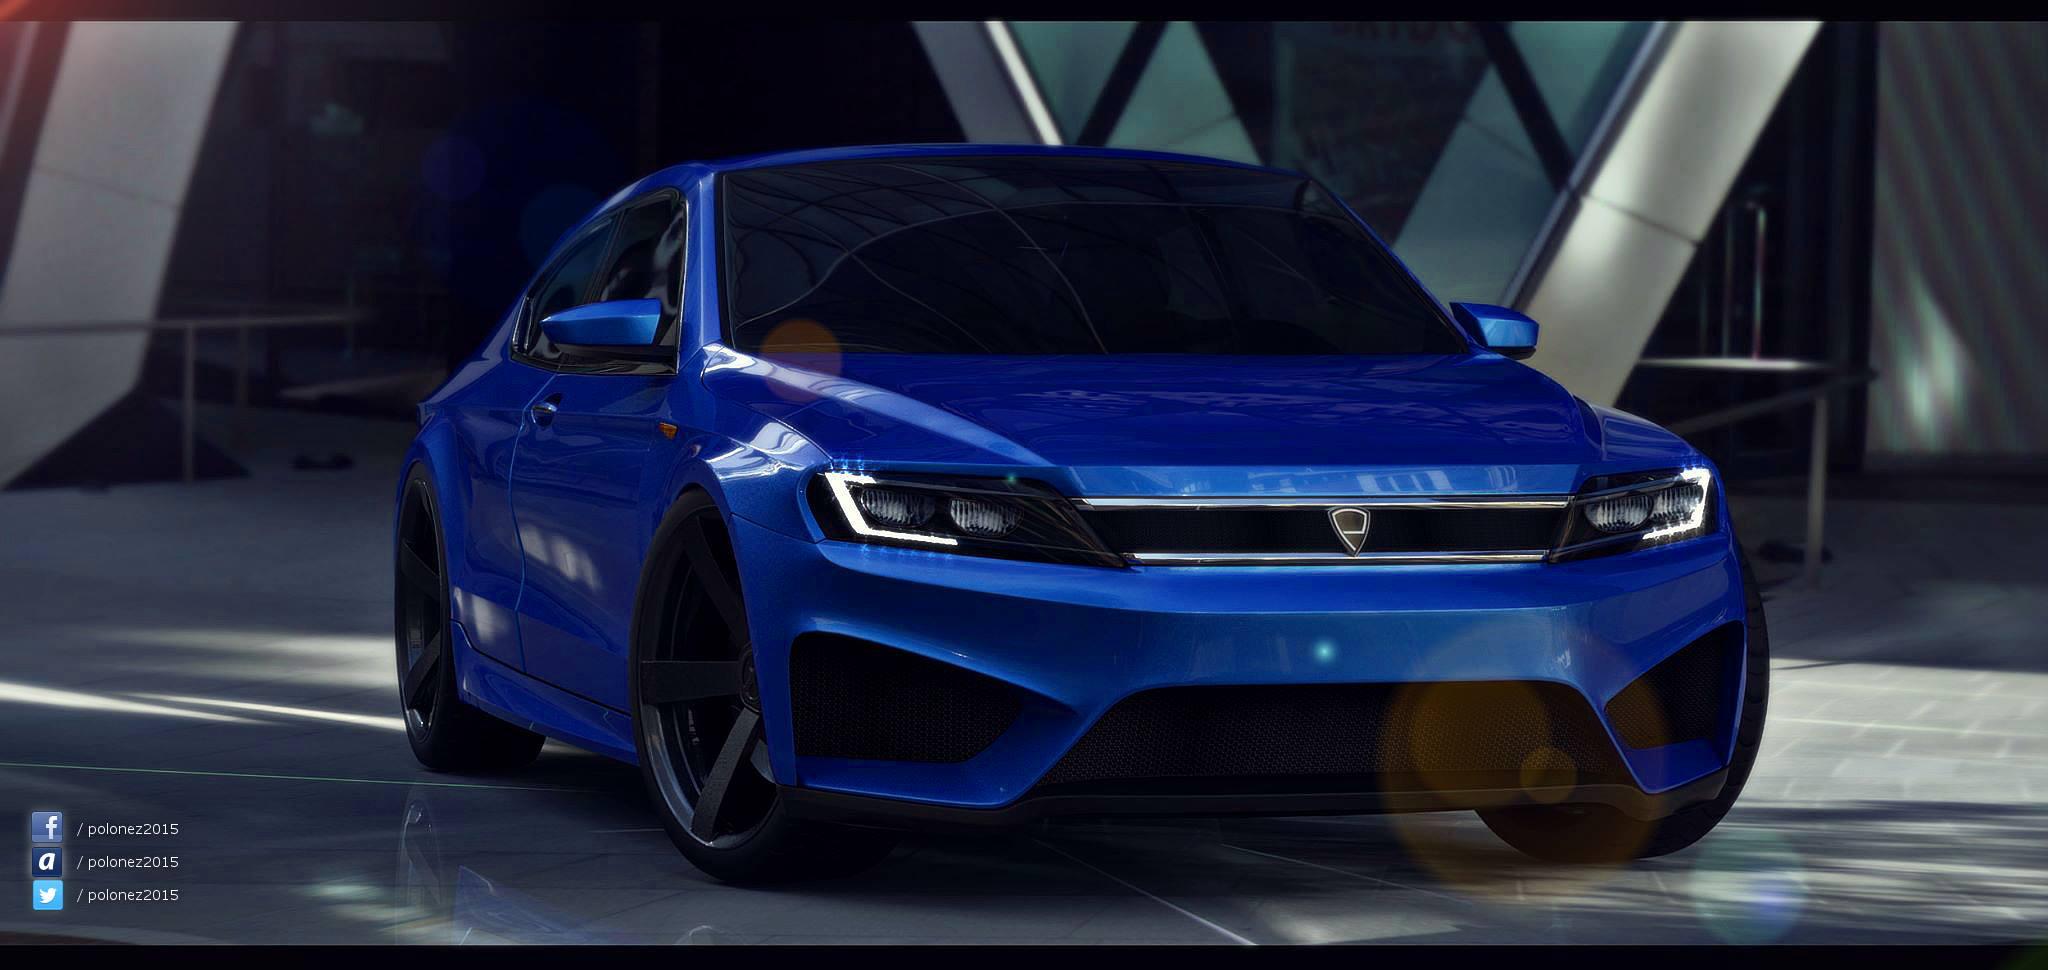 New 2015 Polonez Concept Car Looks Pretty Damn Cool